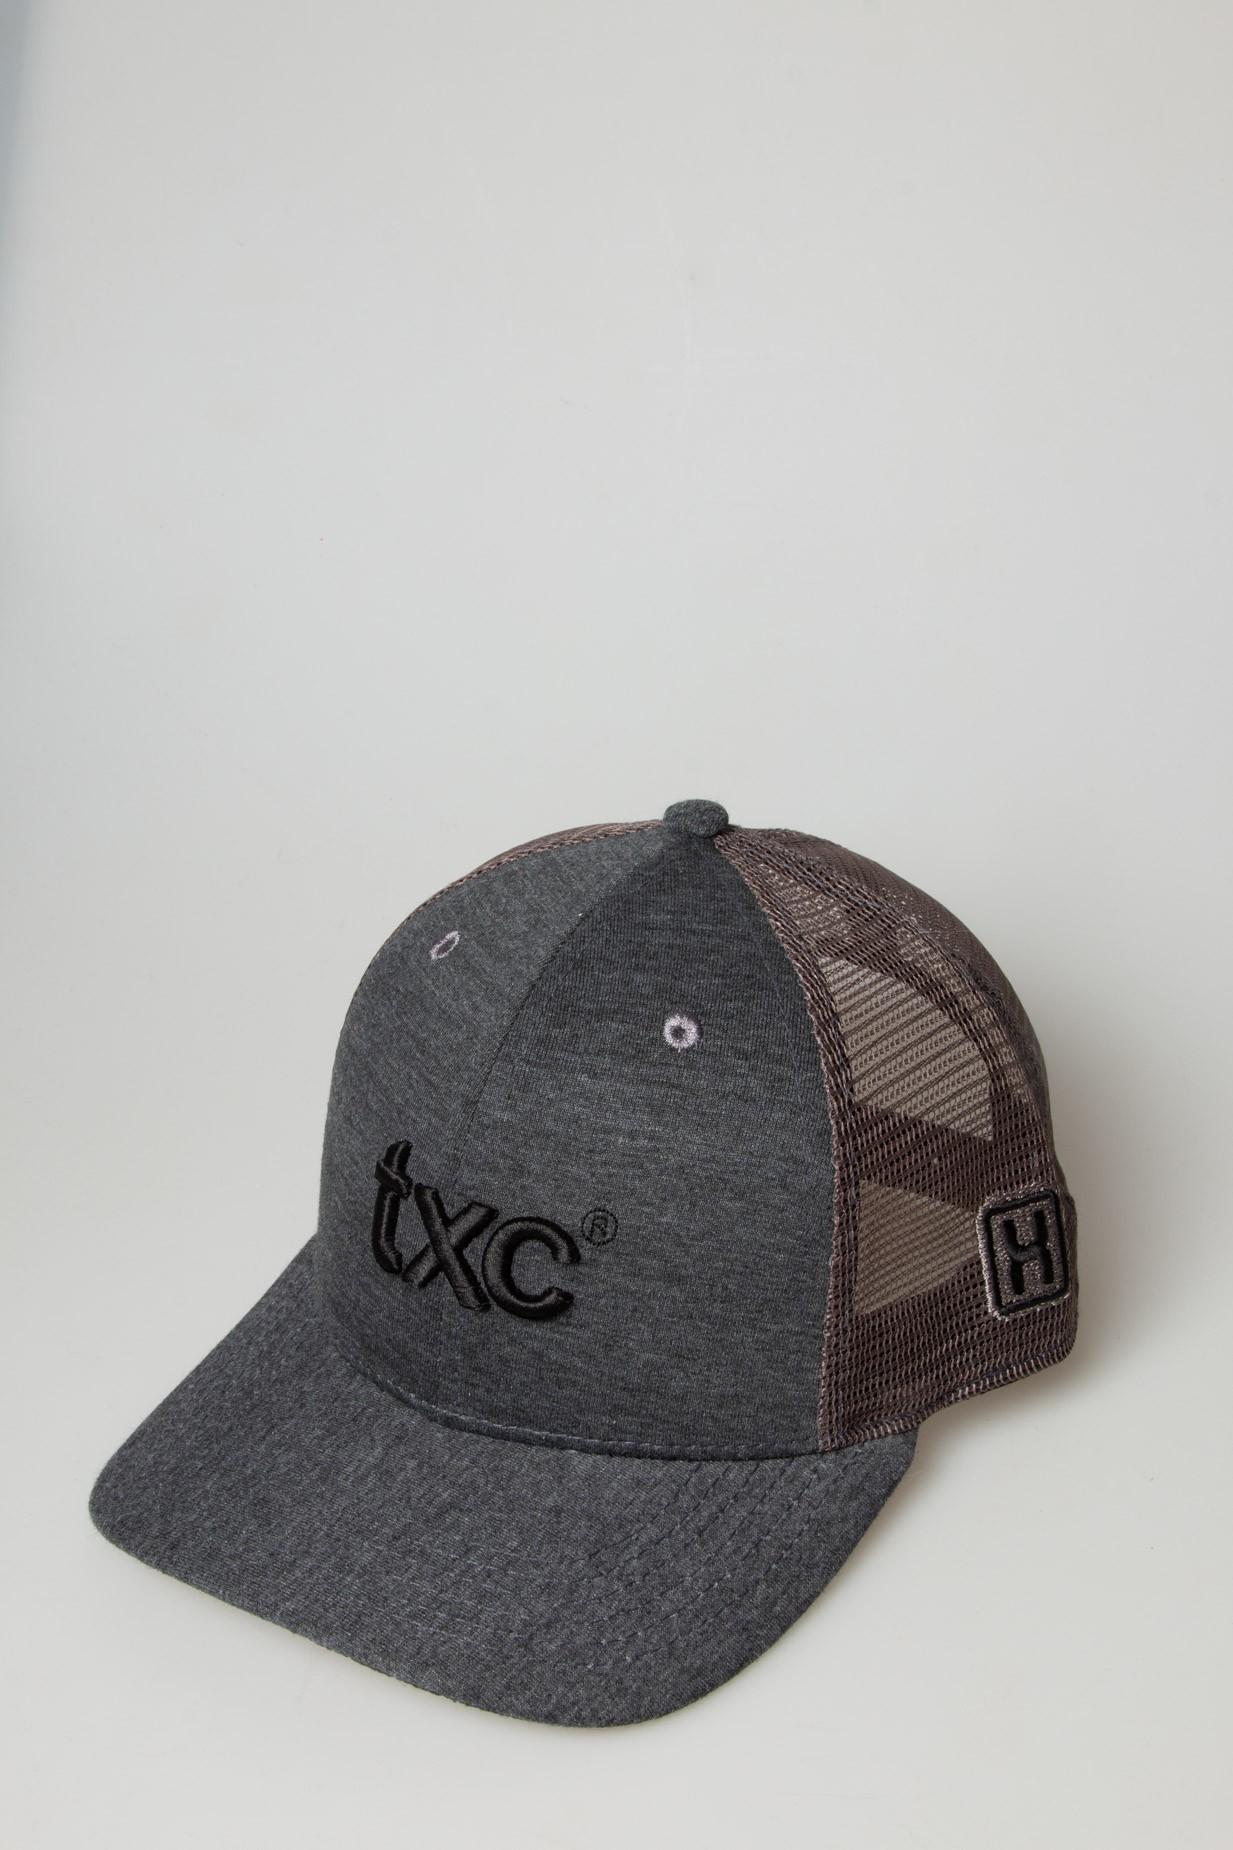 Boné TXC Brand Aba Curva  978C